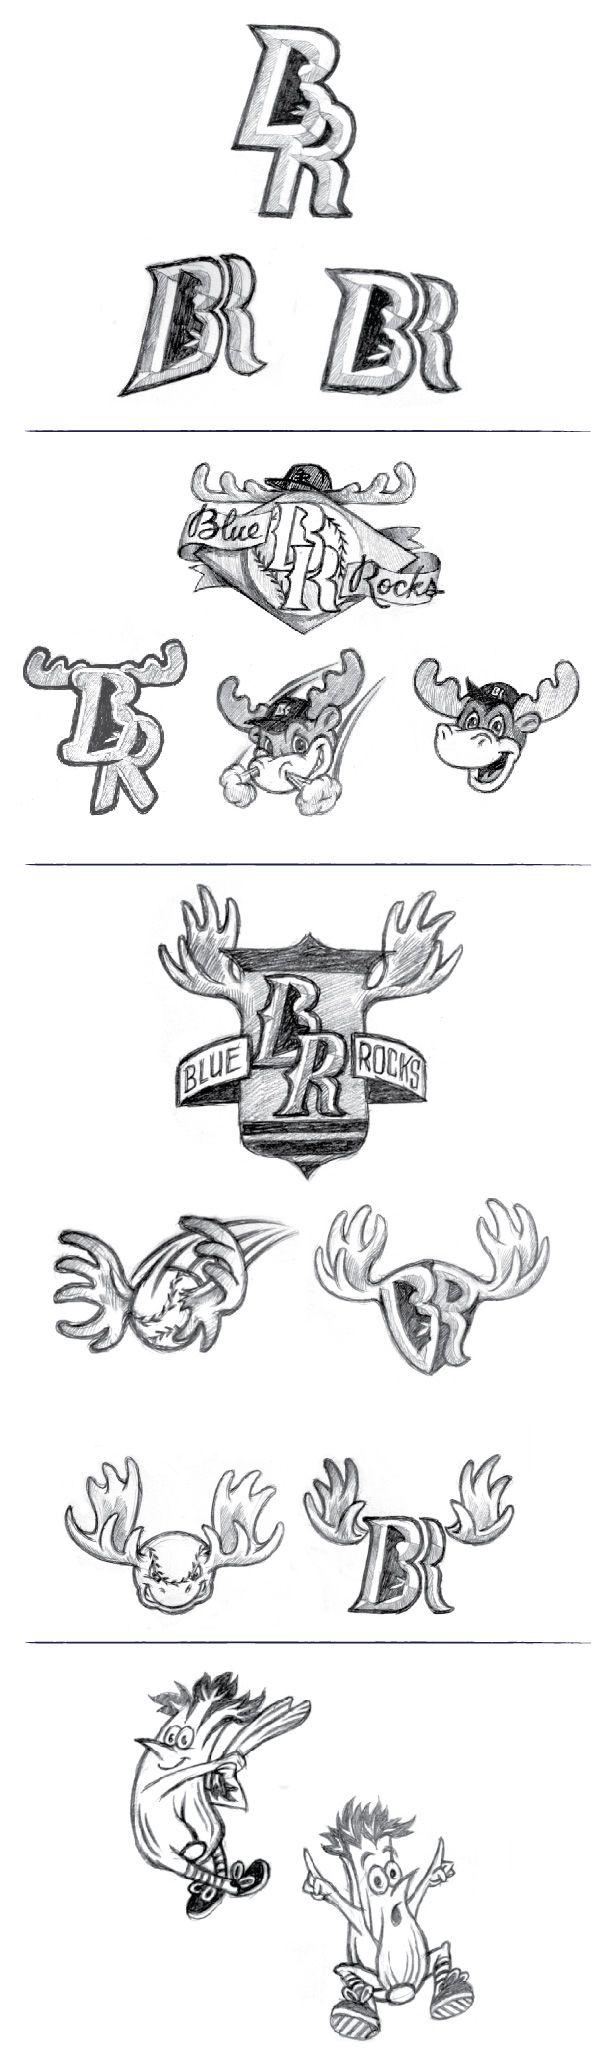 Nice process shot of the Wilmington Blue Rocks Logo